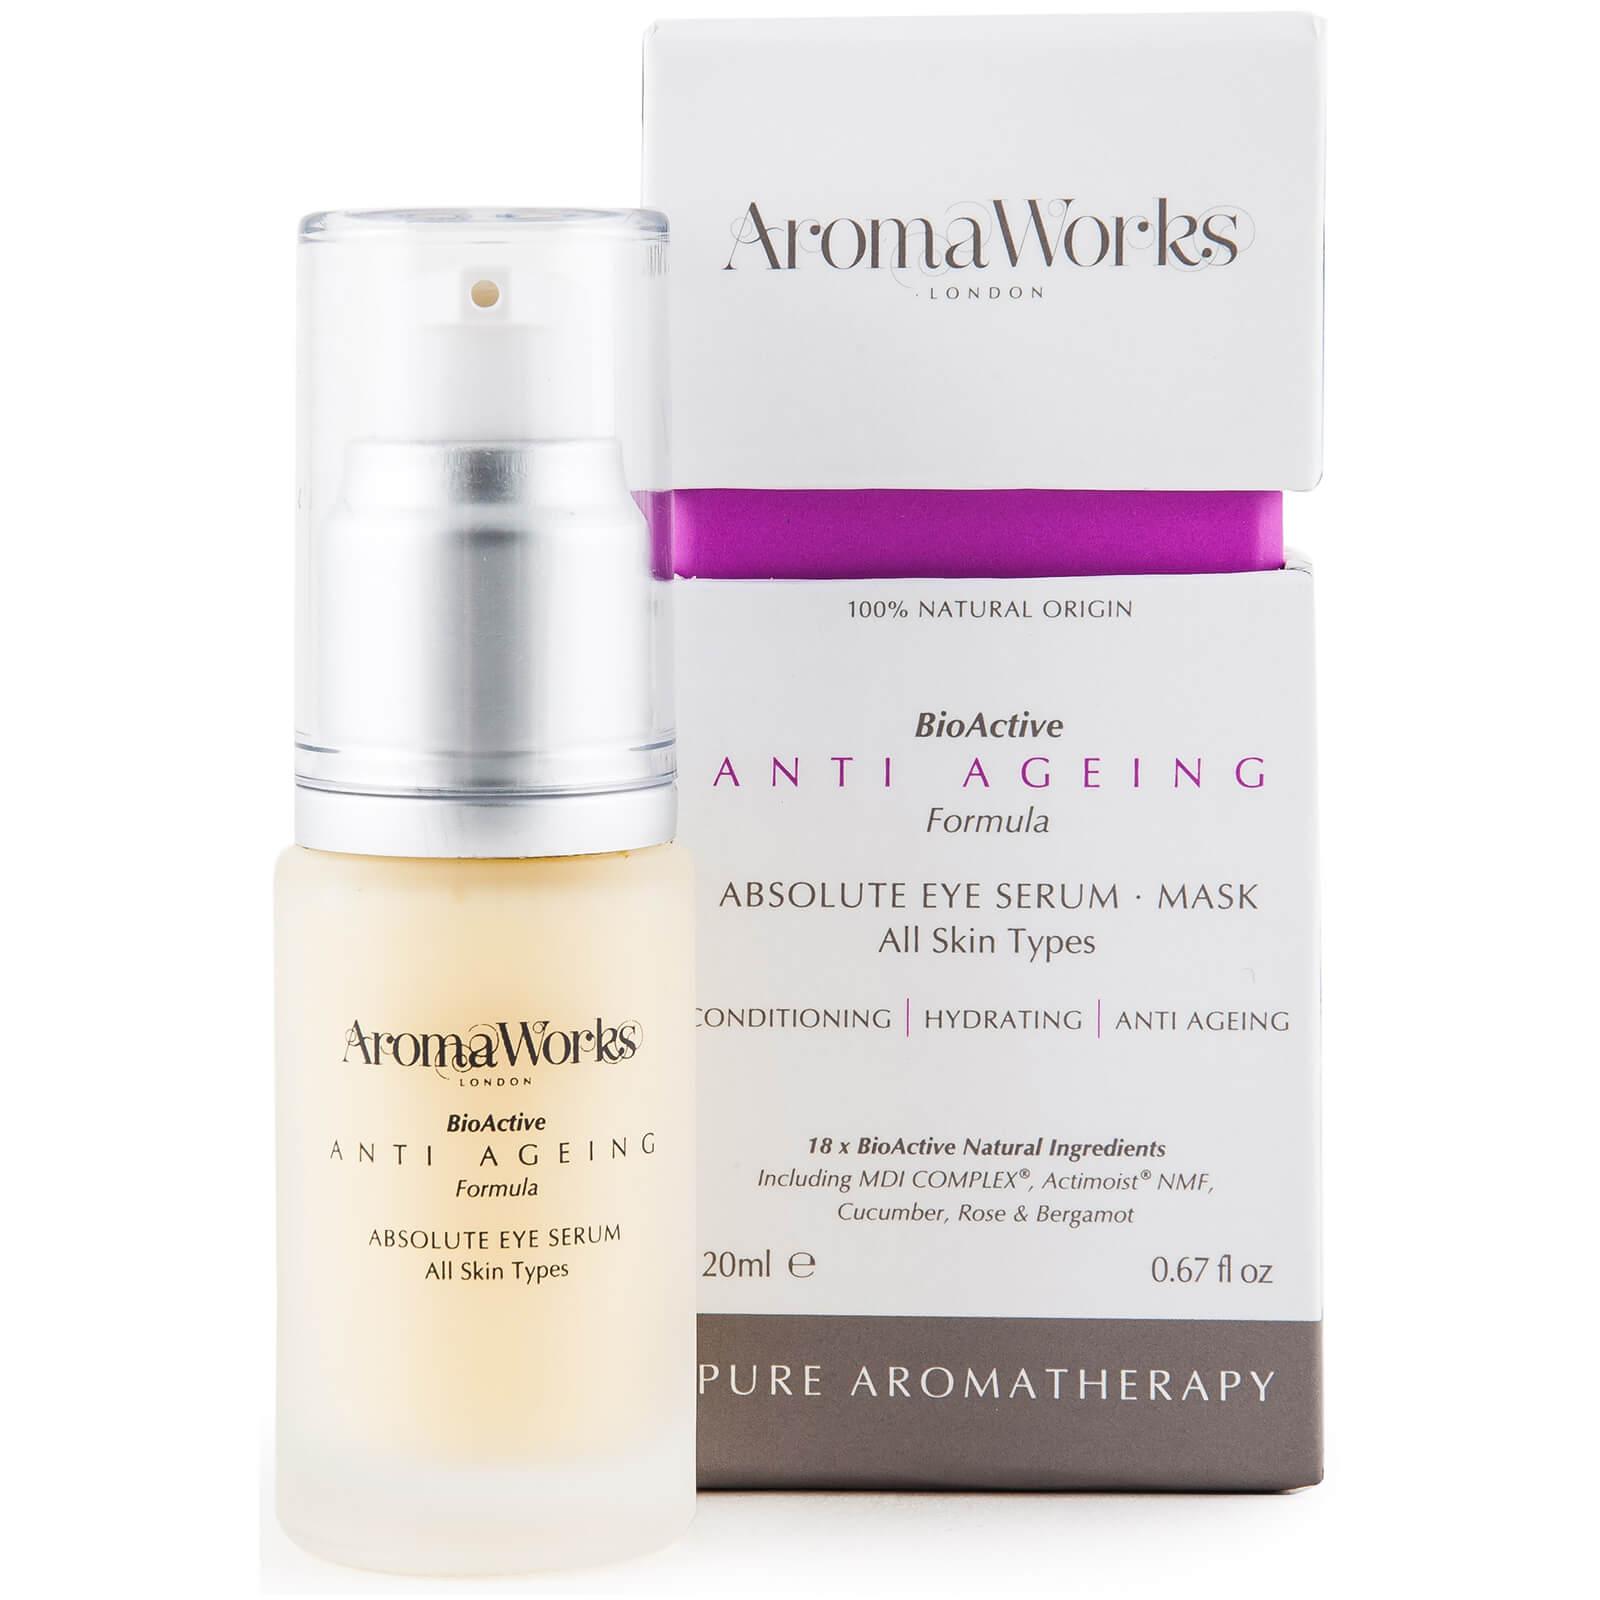 AromaWorks Absolute Eye Serum